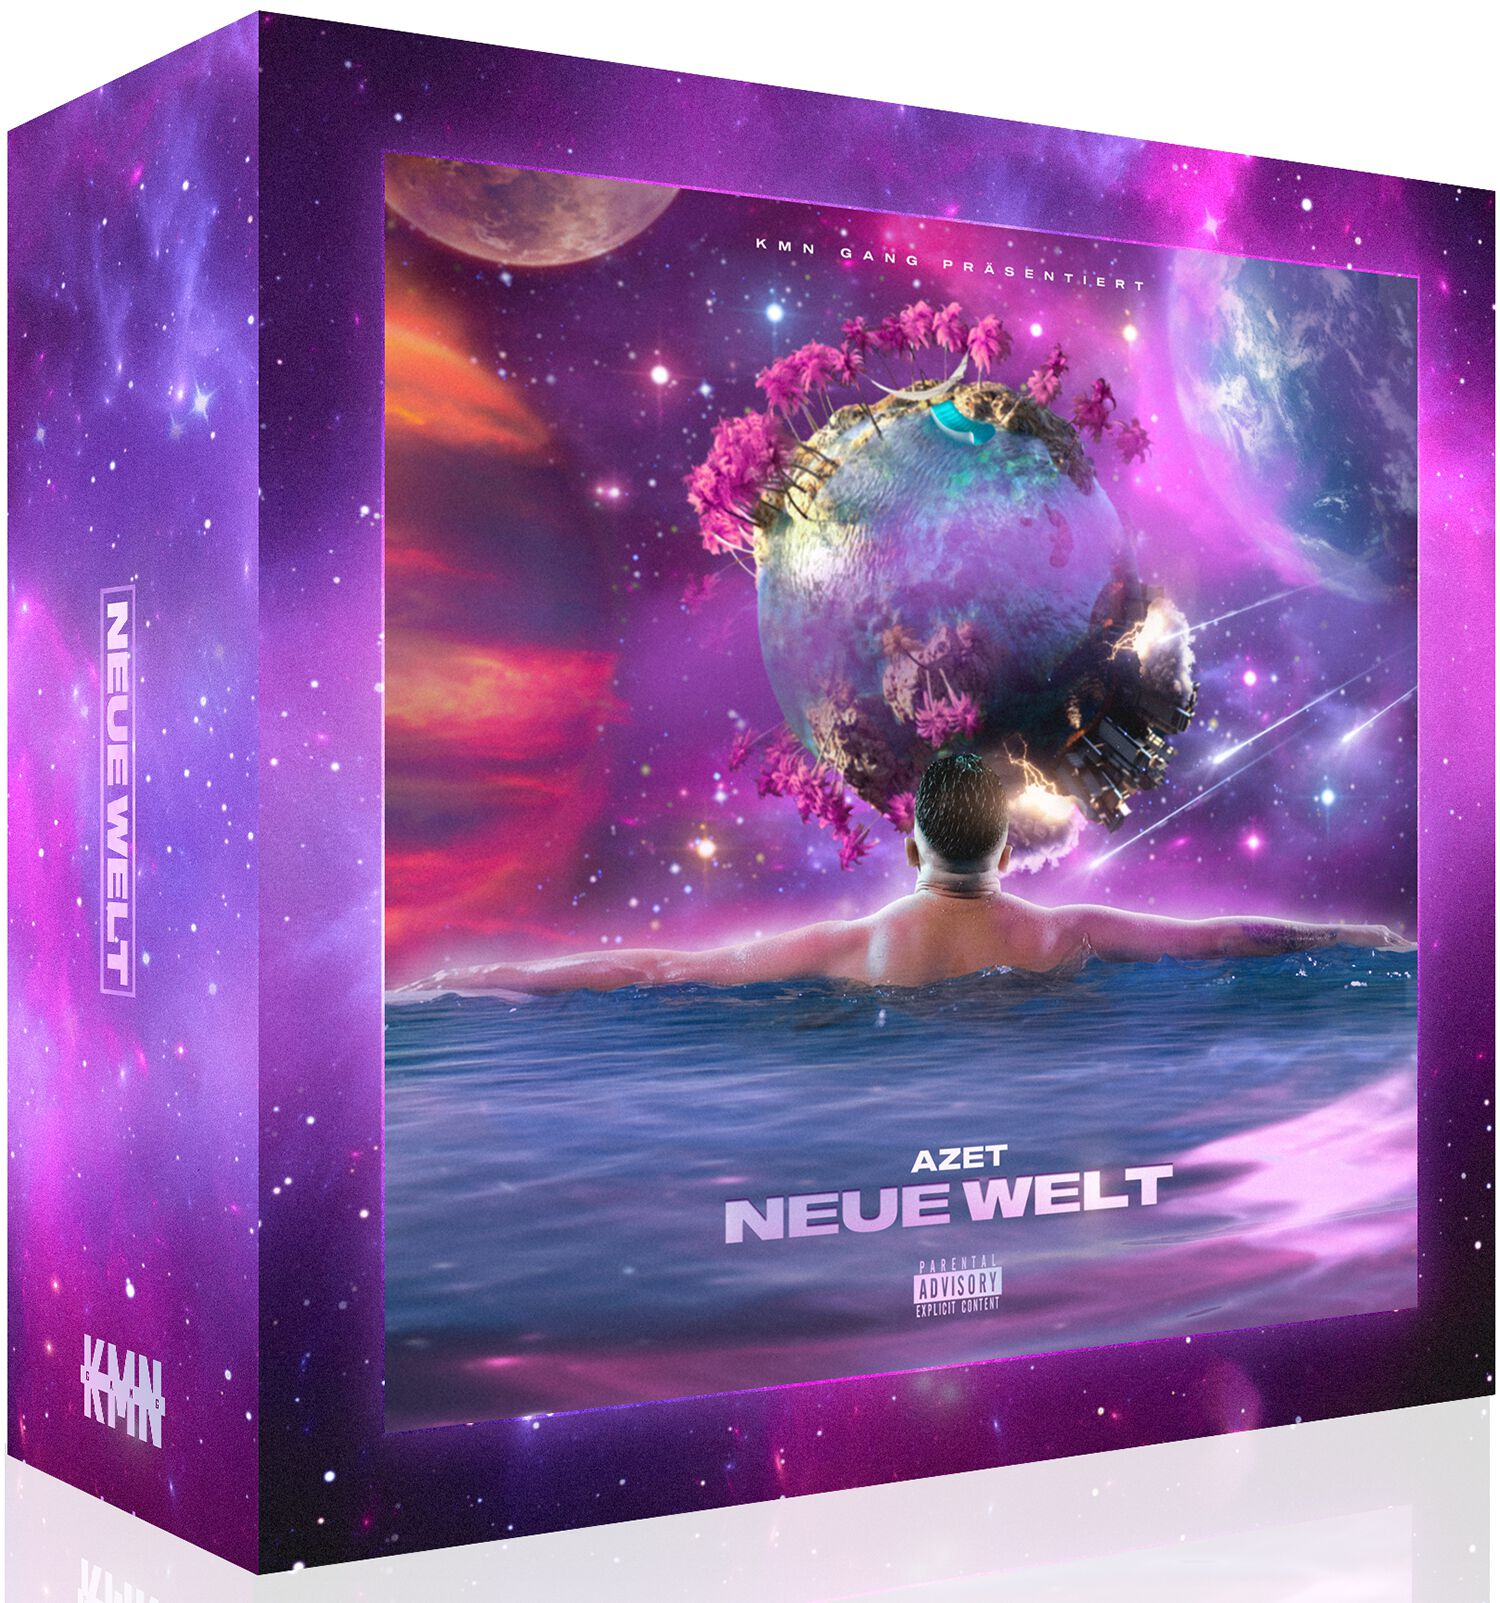 Image of Azet Neue Welt CD Standard